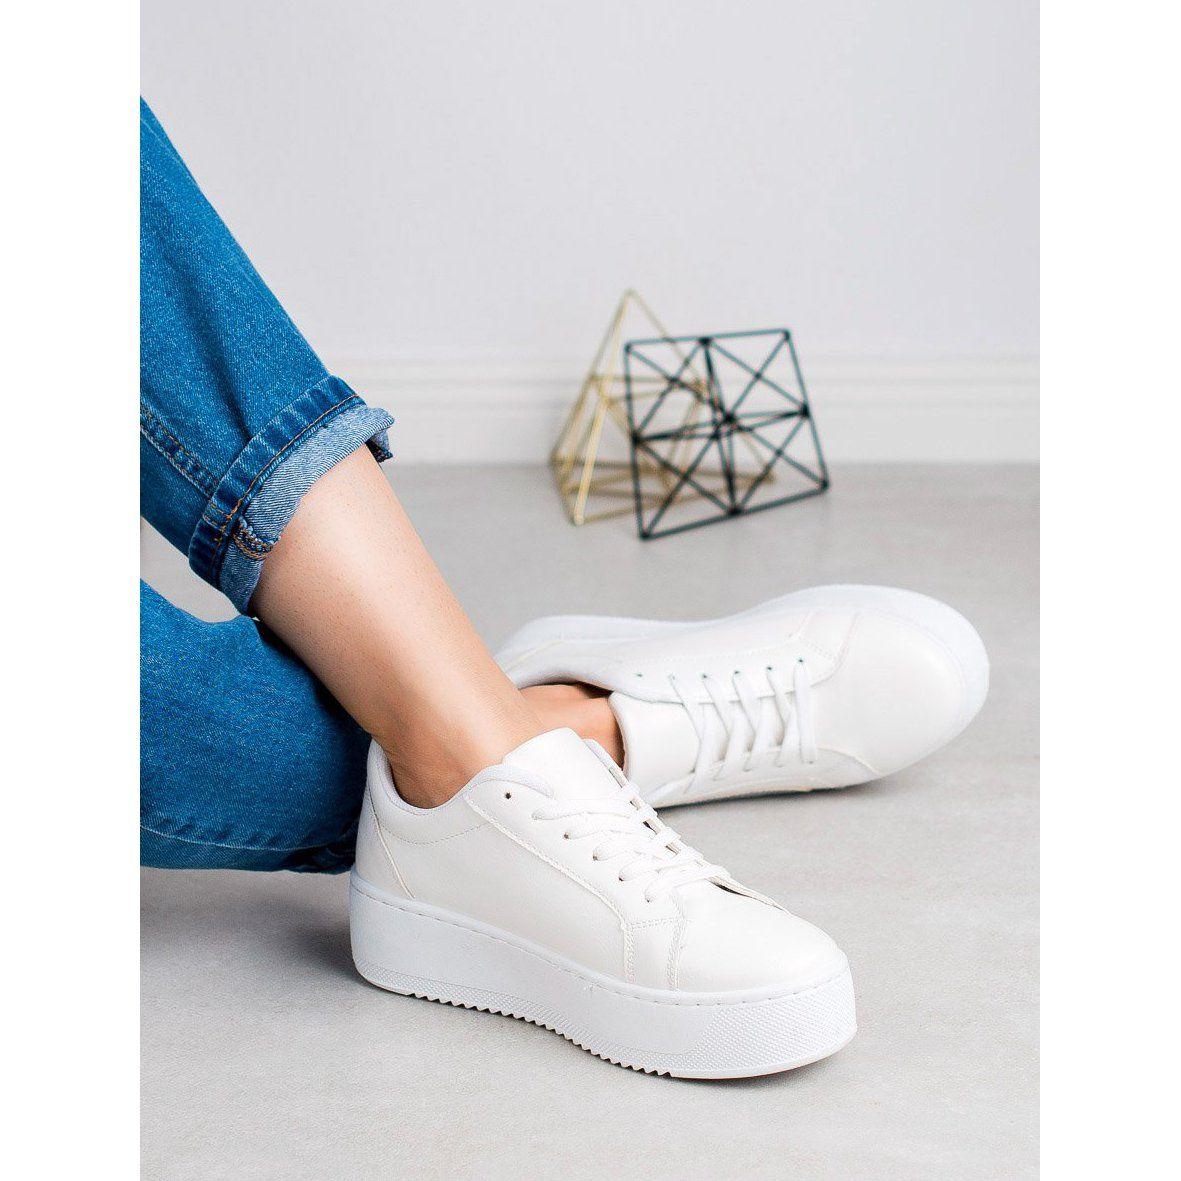 Shelovet Buty Sportowe Na Platformie Biale Sneakers Tretorn Sneaker Shoes